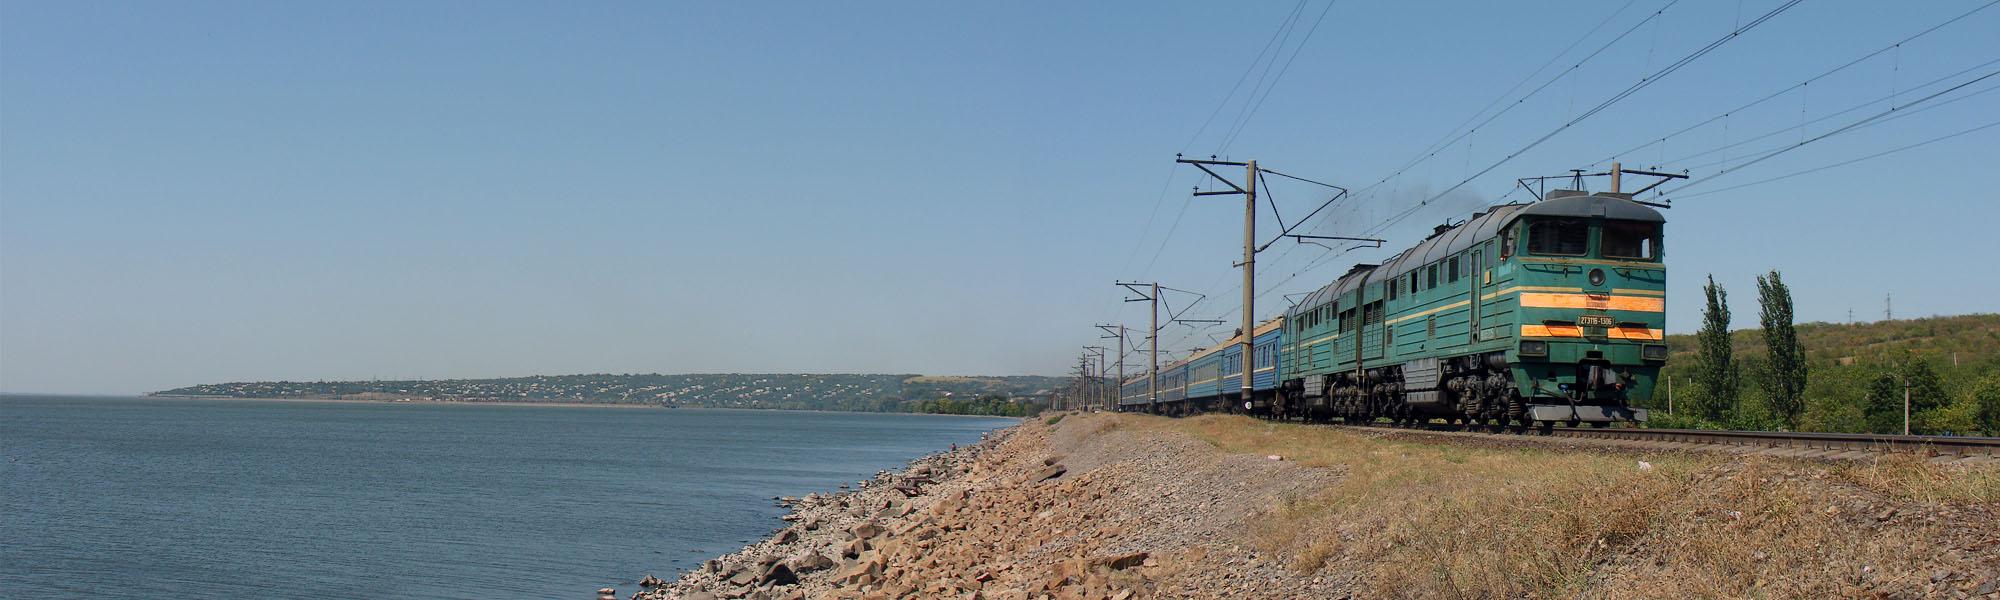 2тэ116-1306 на берегу каховского моря